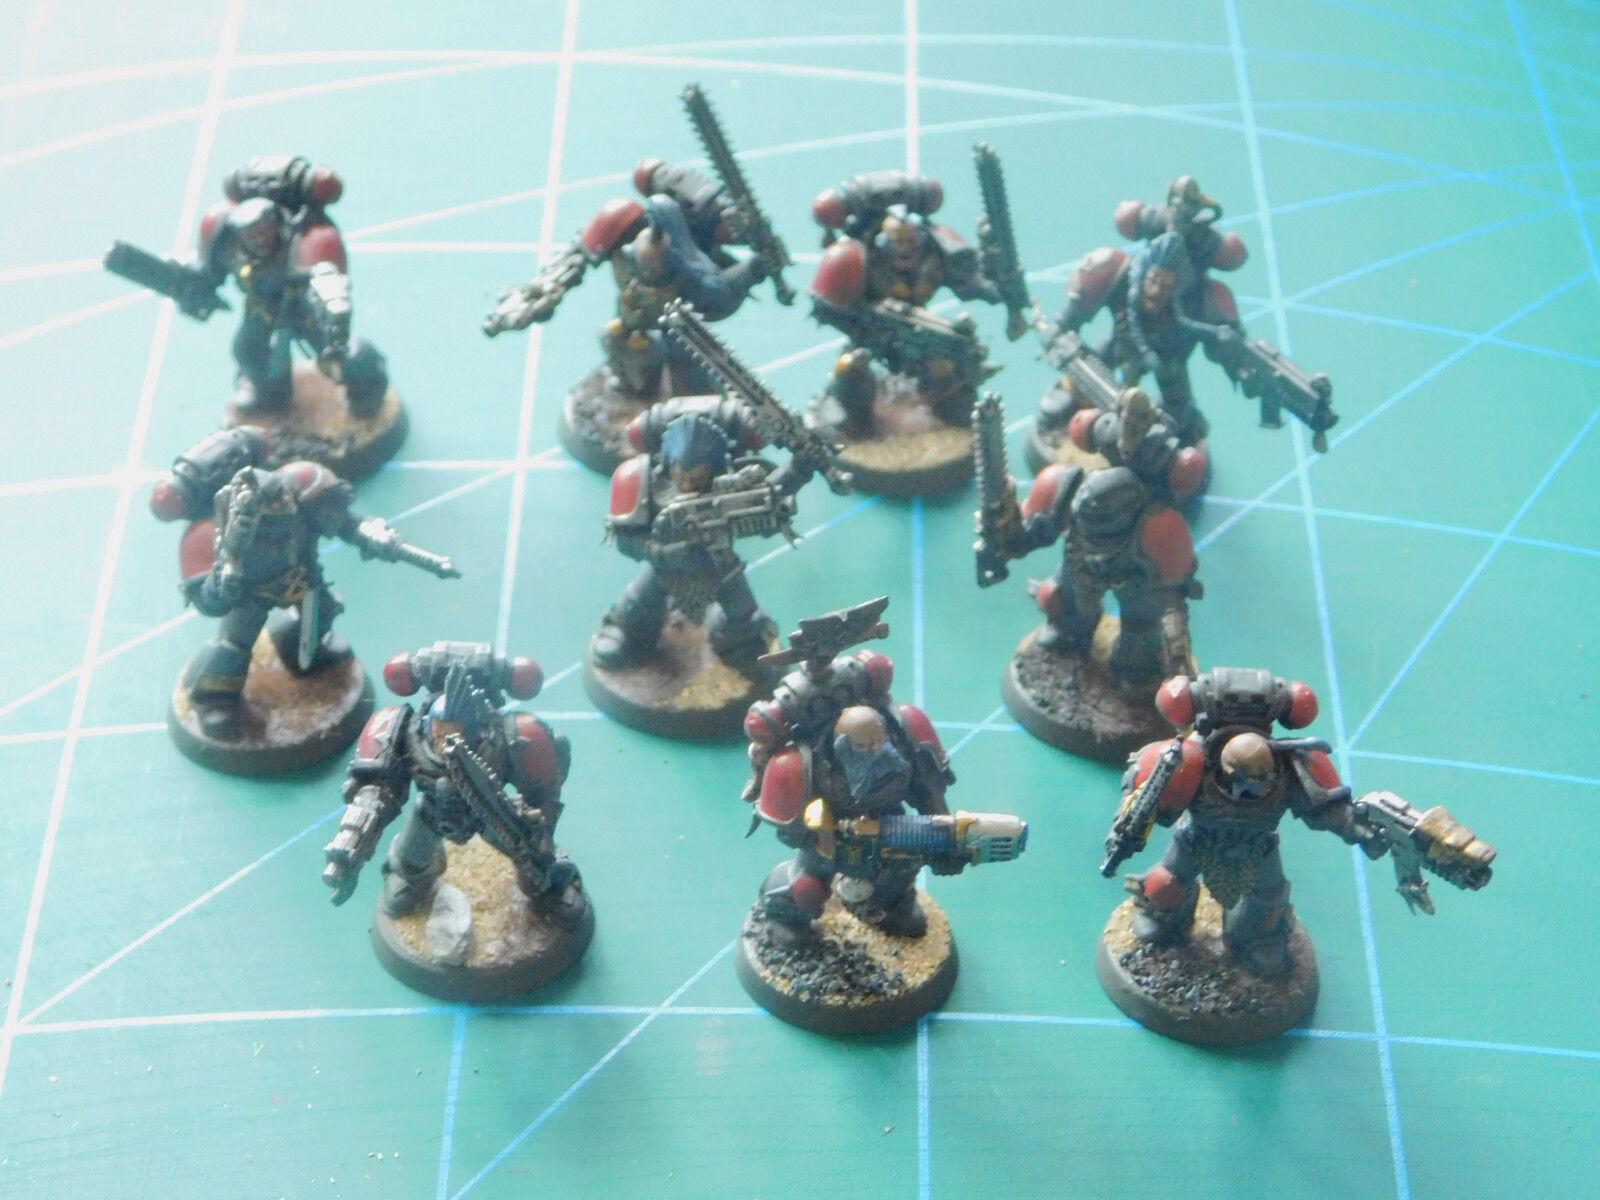 12 warhammer 40k dungeons dragons space marine painted plastic figures